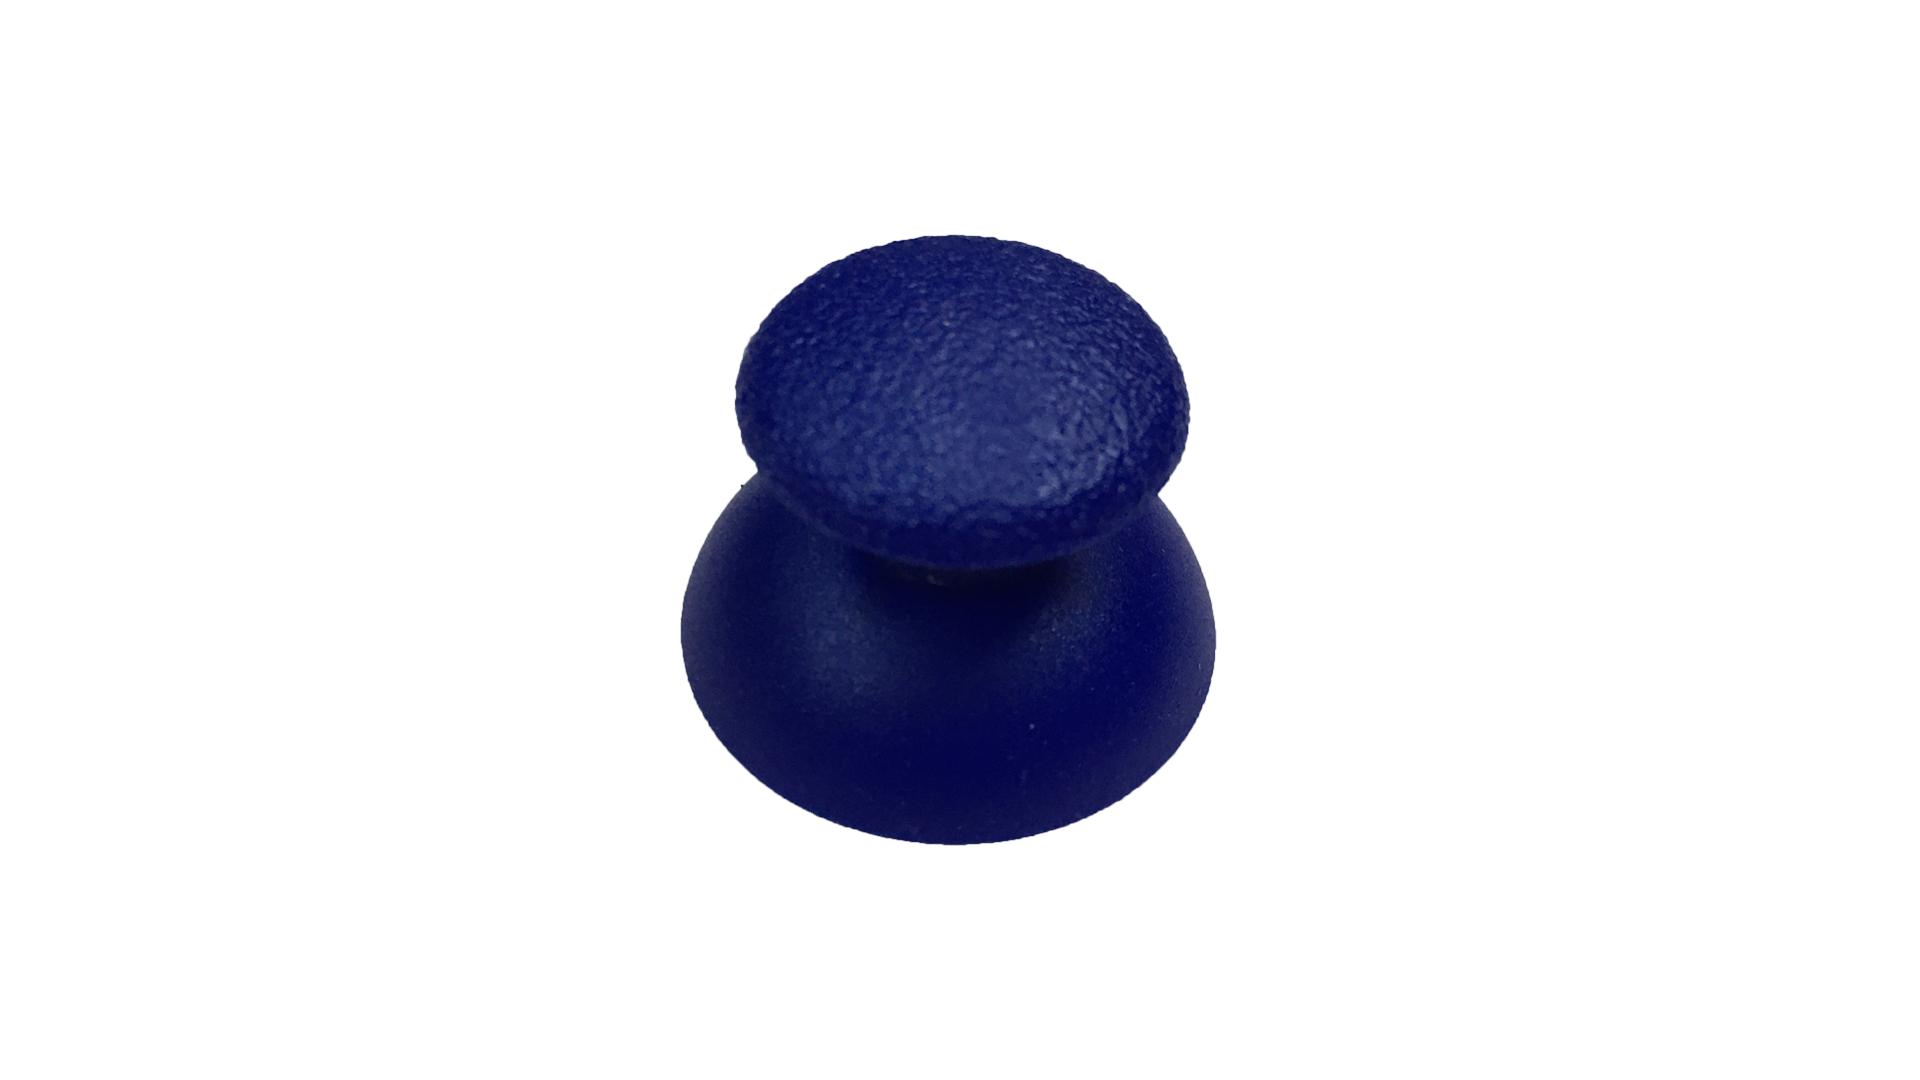 PS2 Replacement Parts Joystick Thumbstick Analog Stick CAP